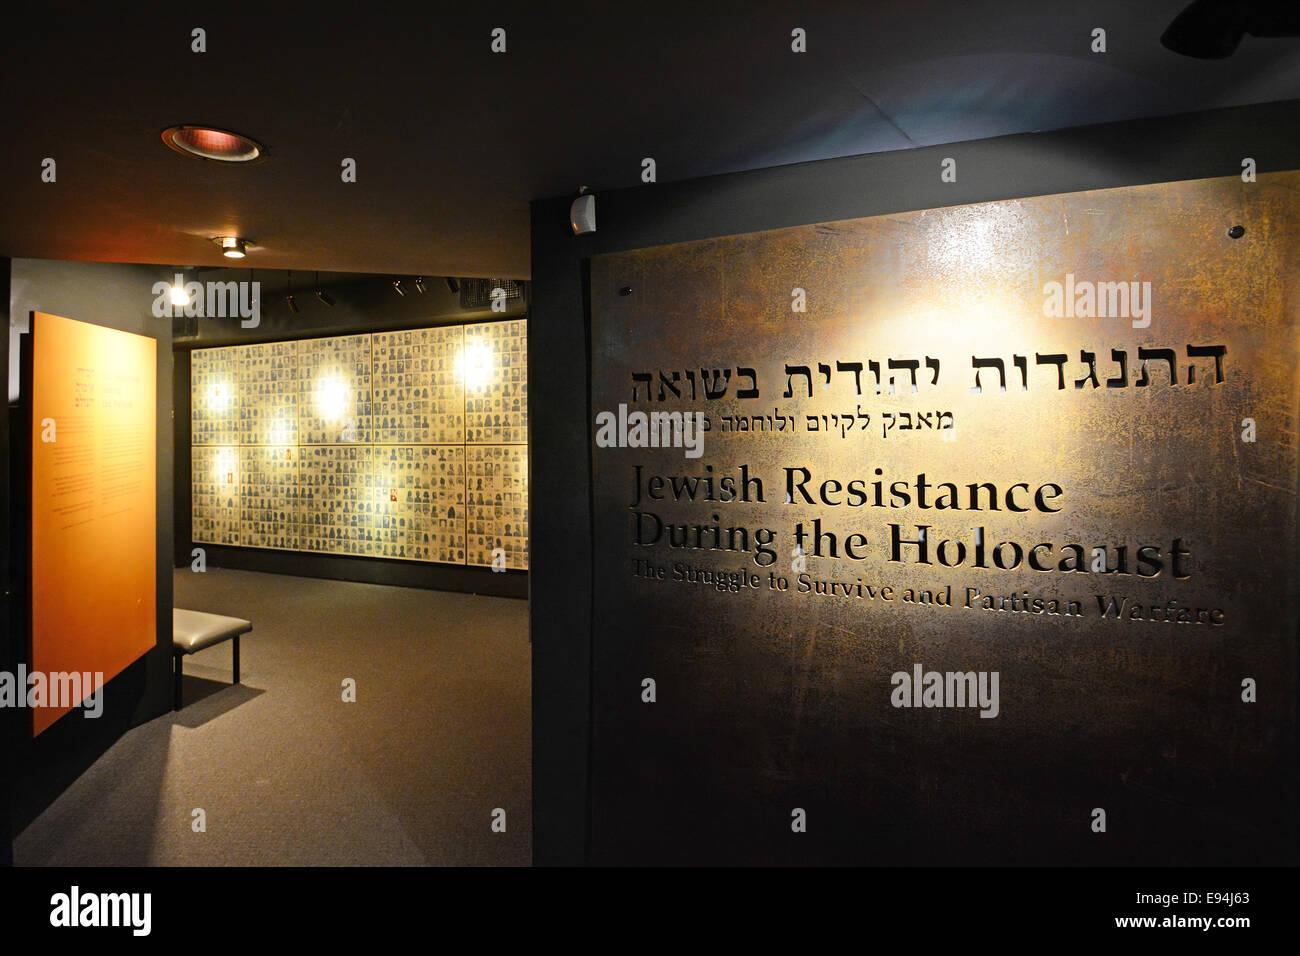 The Ghetto Fighters' House in Kibbutz Lohamei Hagetaot, Israel - Stock Image